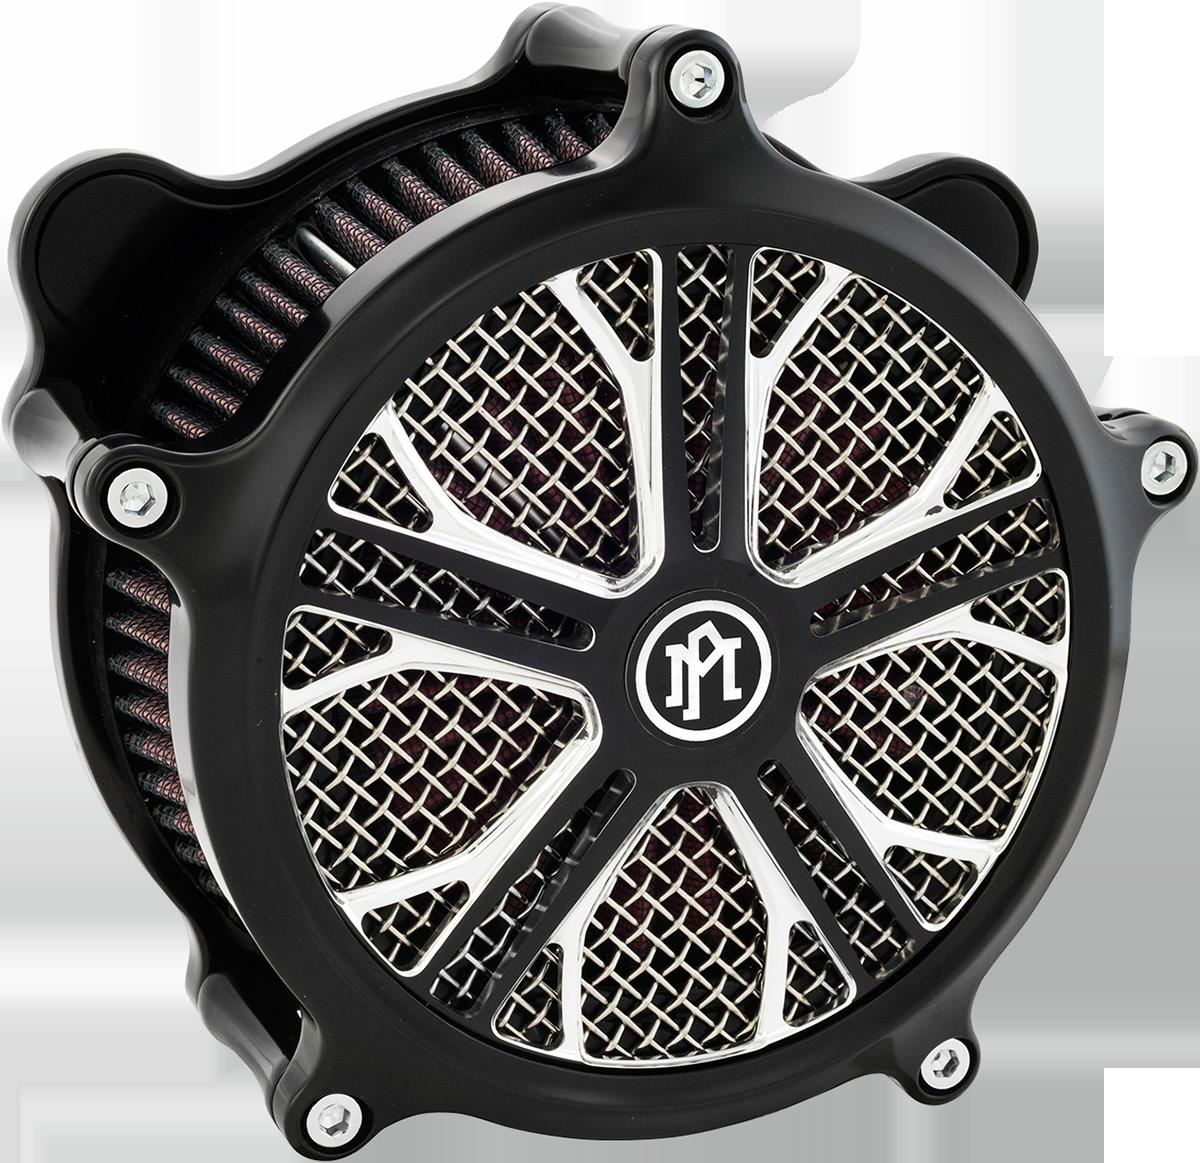 Performance Machine Dixon Matte Platinum Cut Air Cleaner Filter Cover Insert